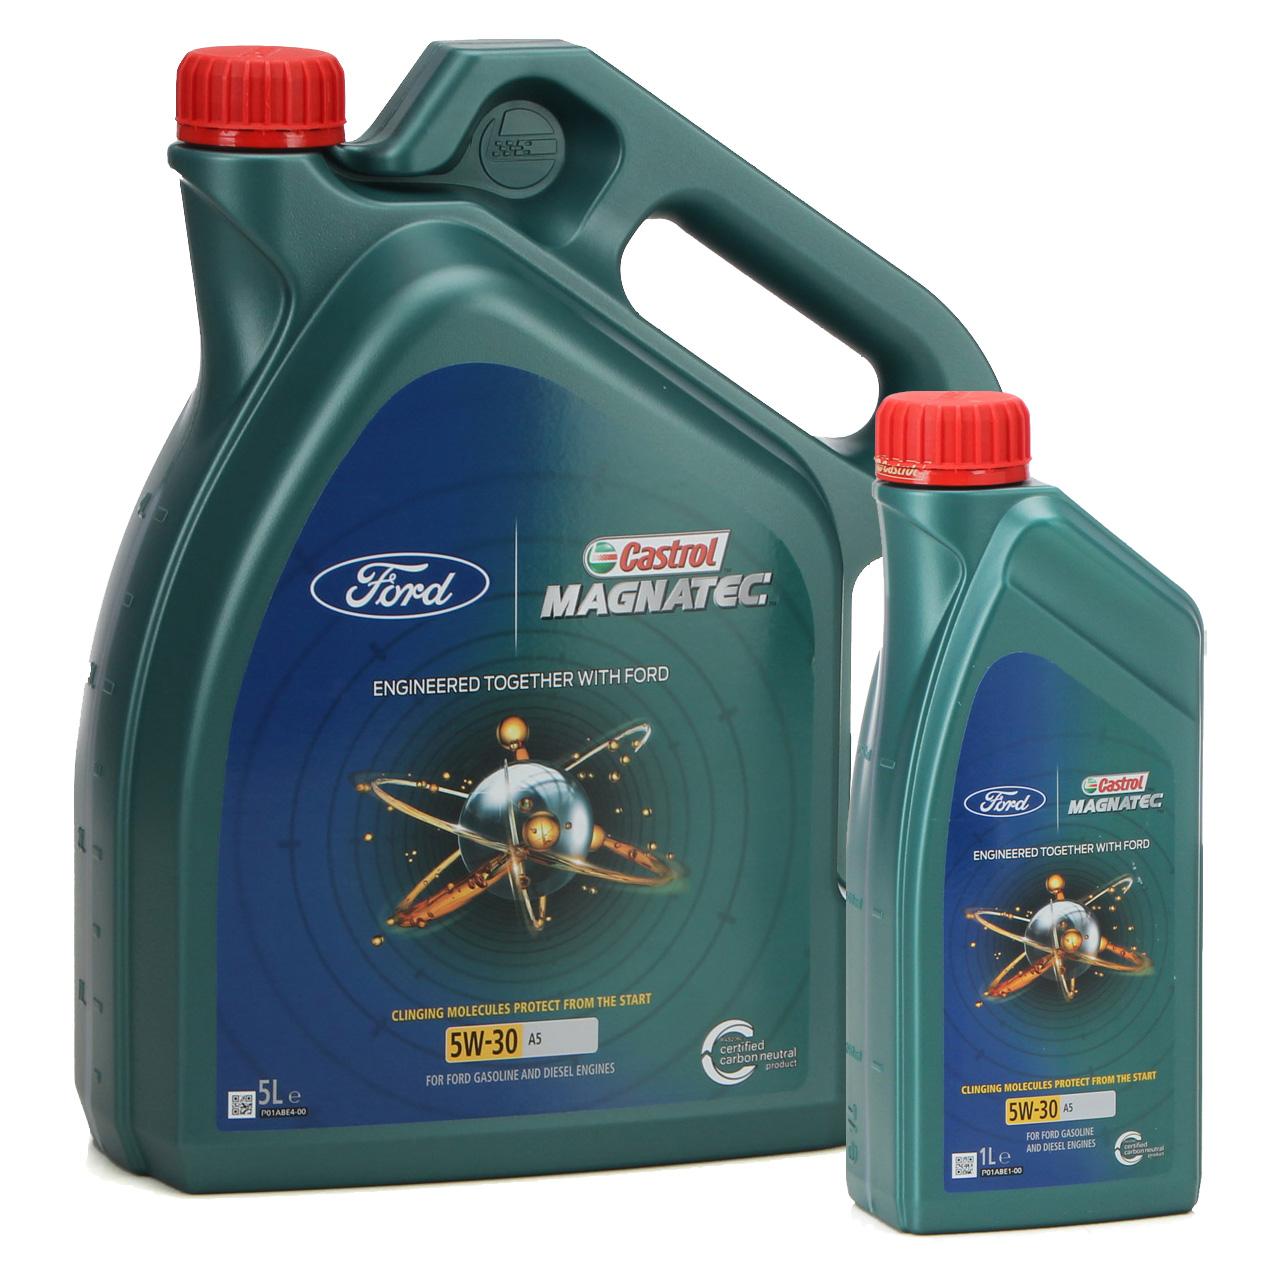 6L 6 Liter ORIGINAL Ford CASTROL Motoröl Öl MAGNATEC A5 5W30 5W-30